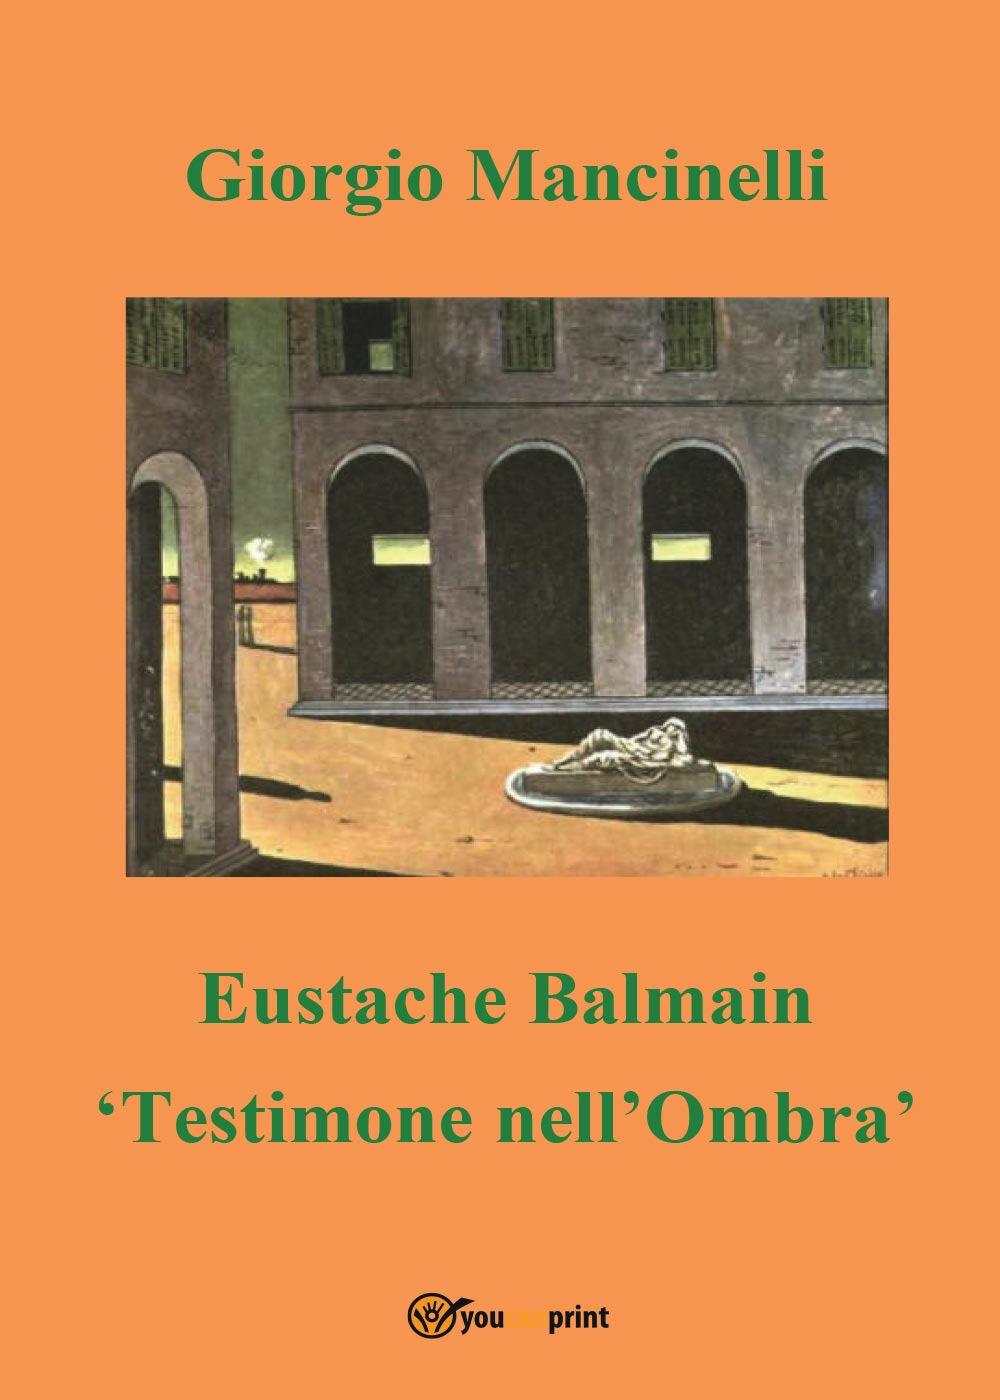 Eustache Balmain. Testimone nell'ombra